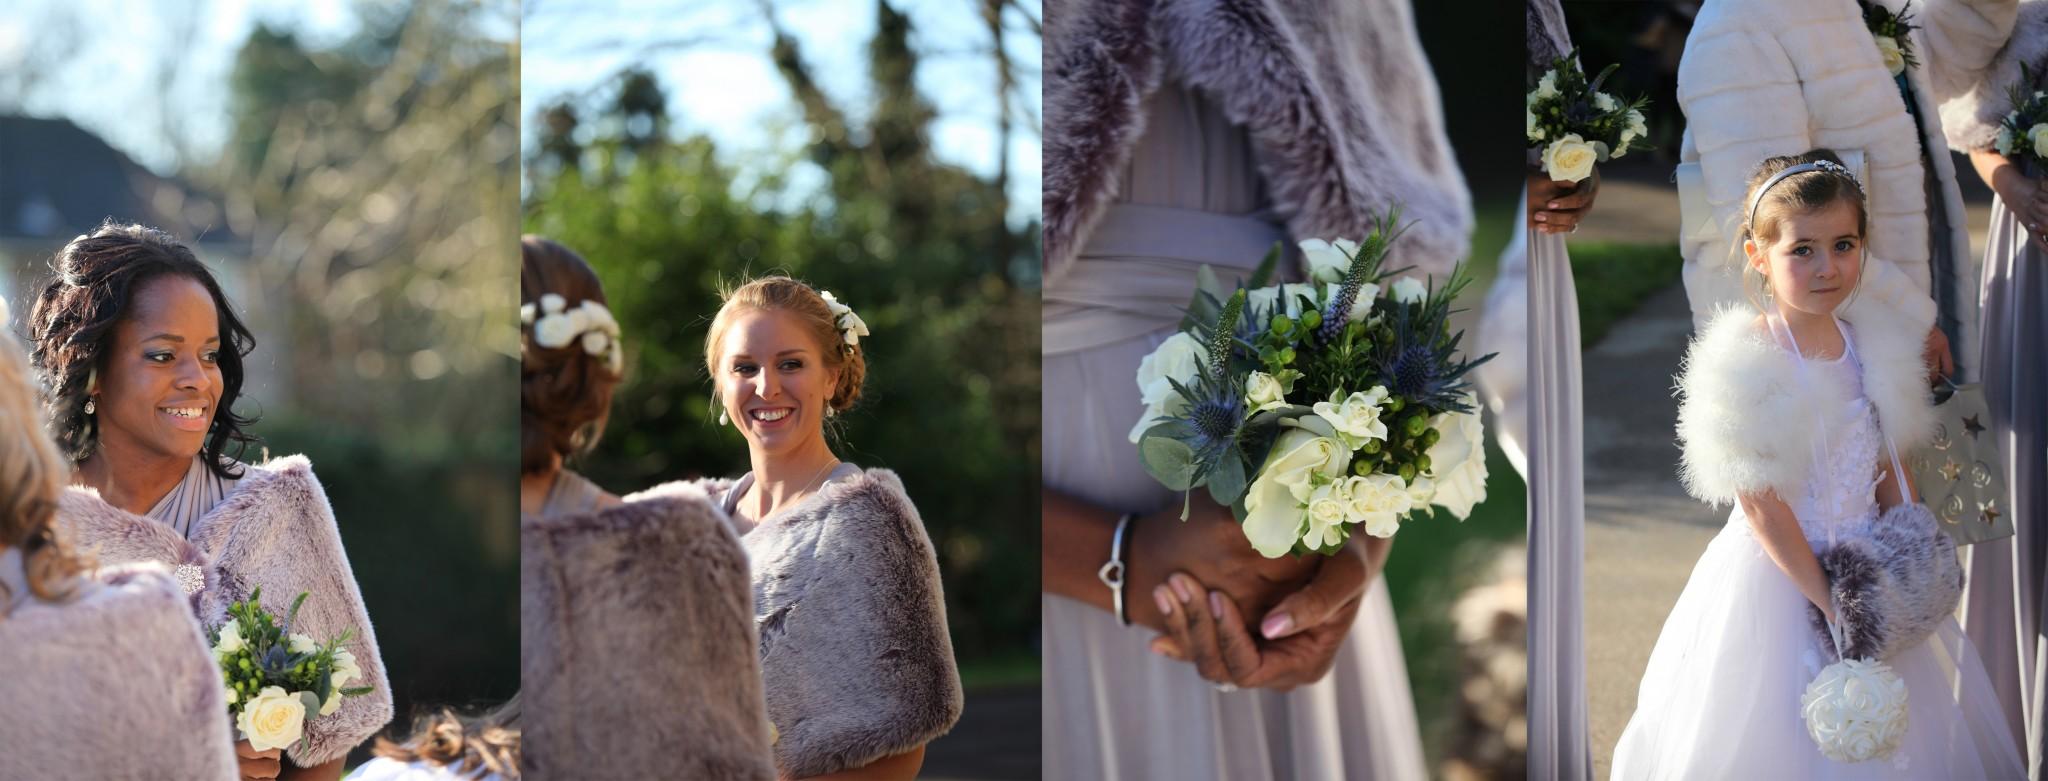 IMG_bridesmaidsmontage